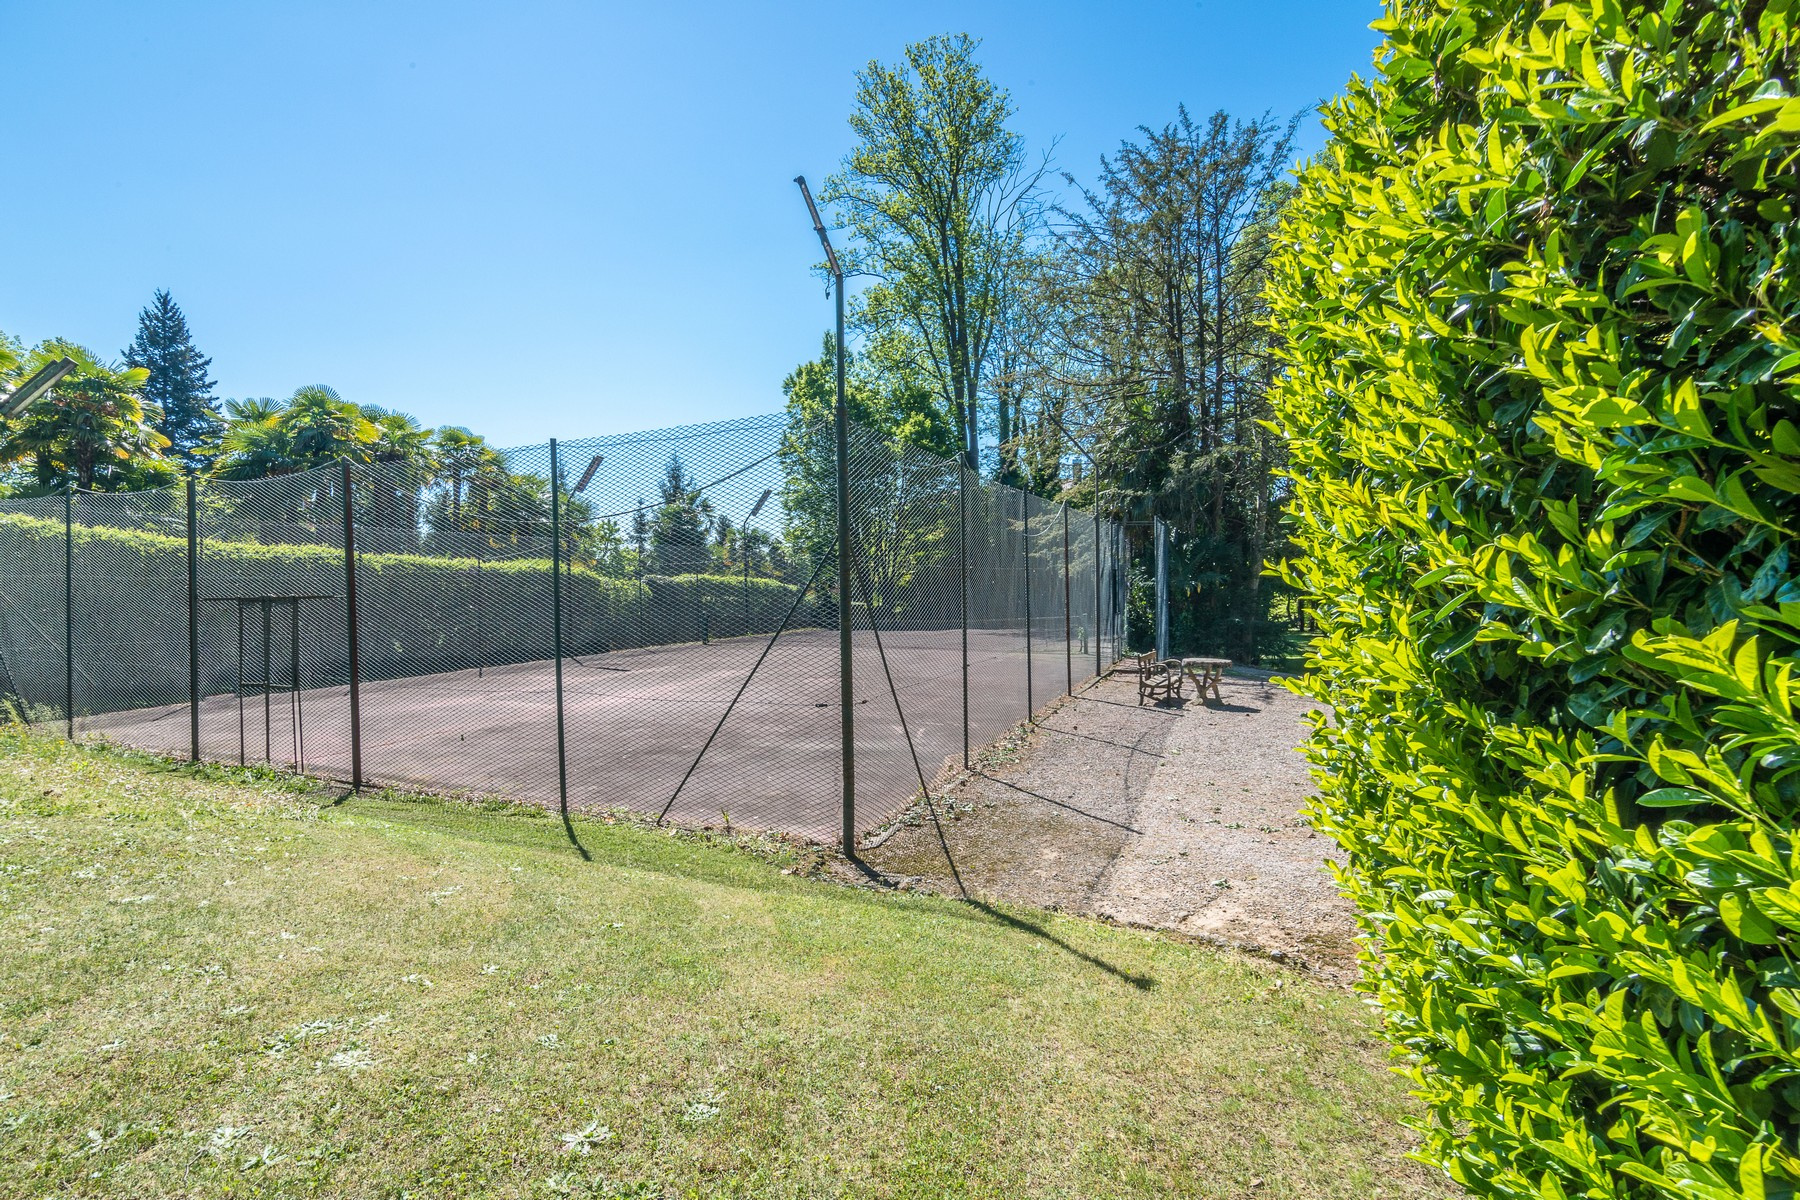 Villa in Vendita a Varese: 5 locali, 1500 mq - Foto 11